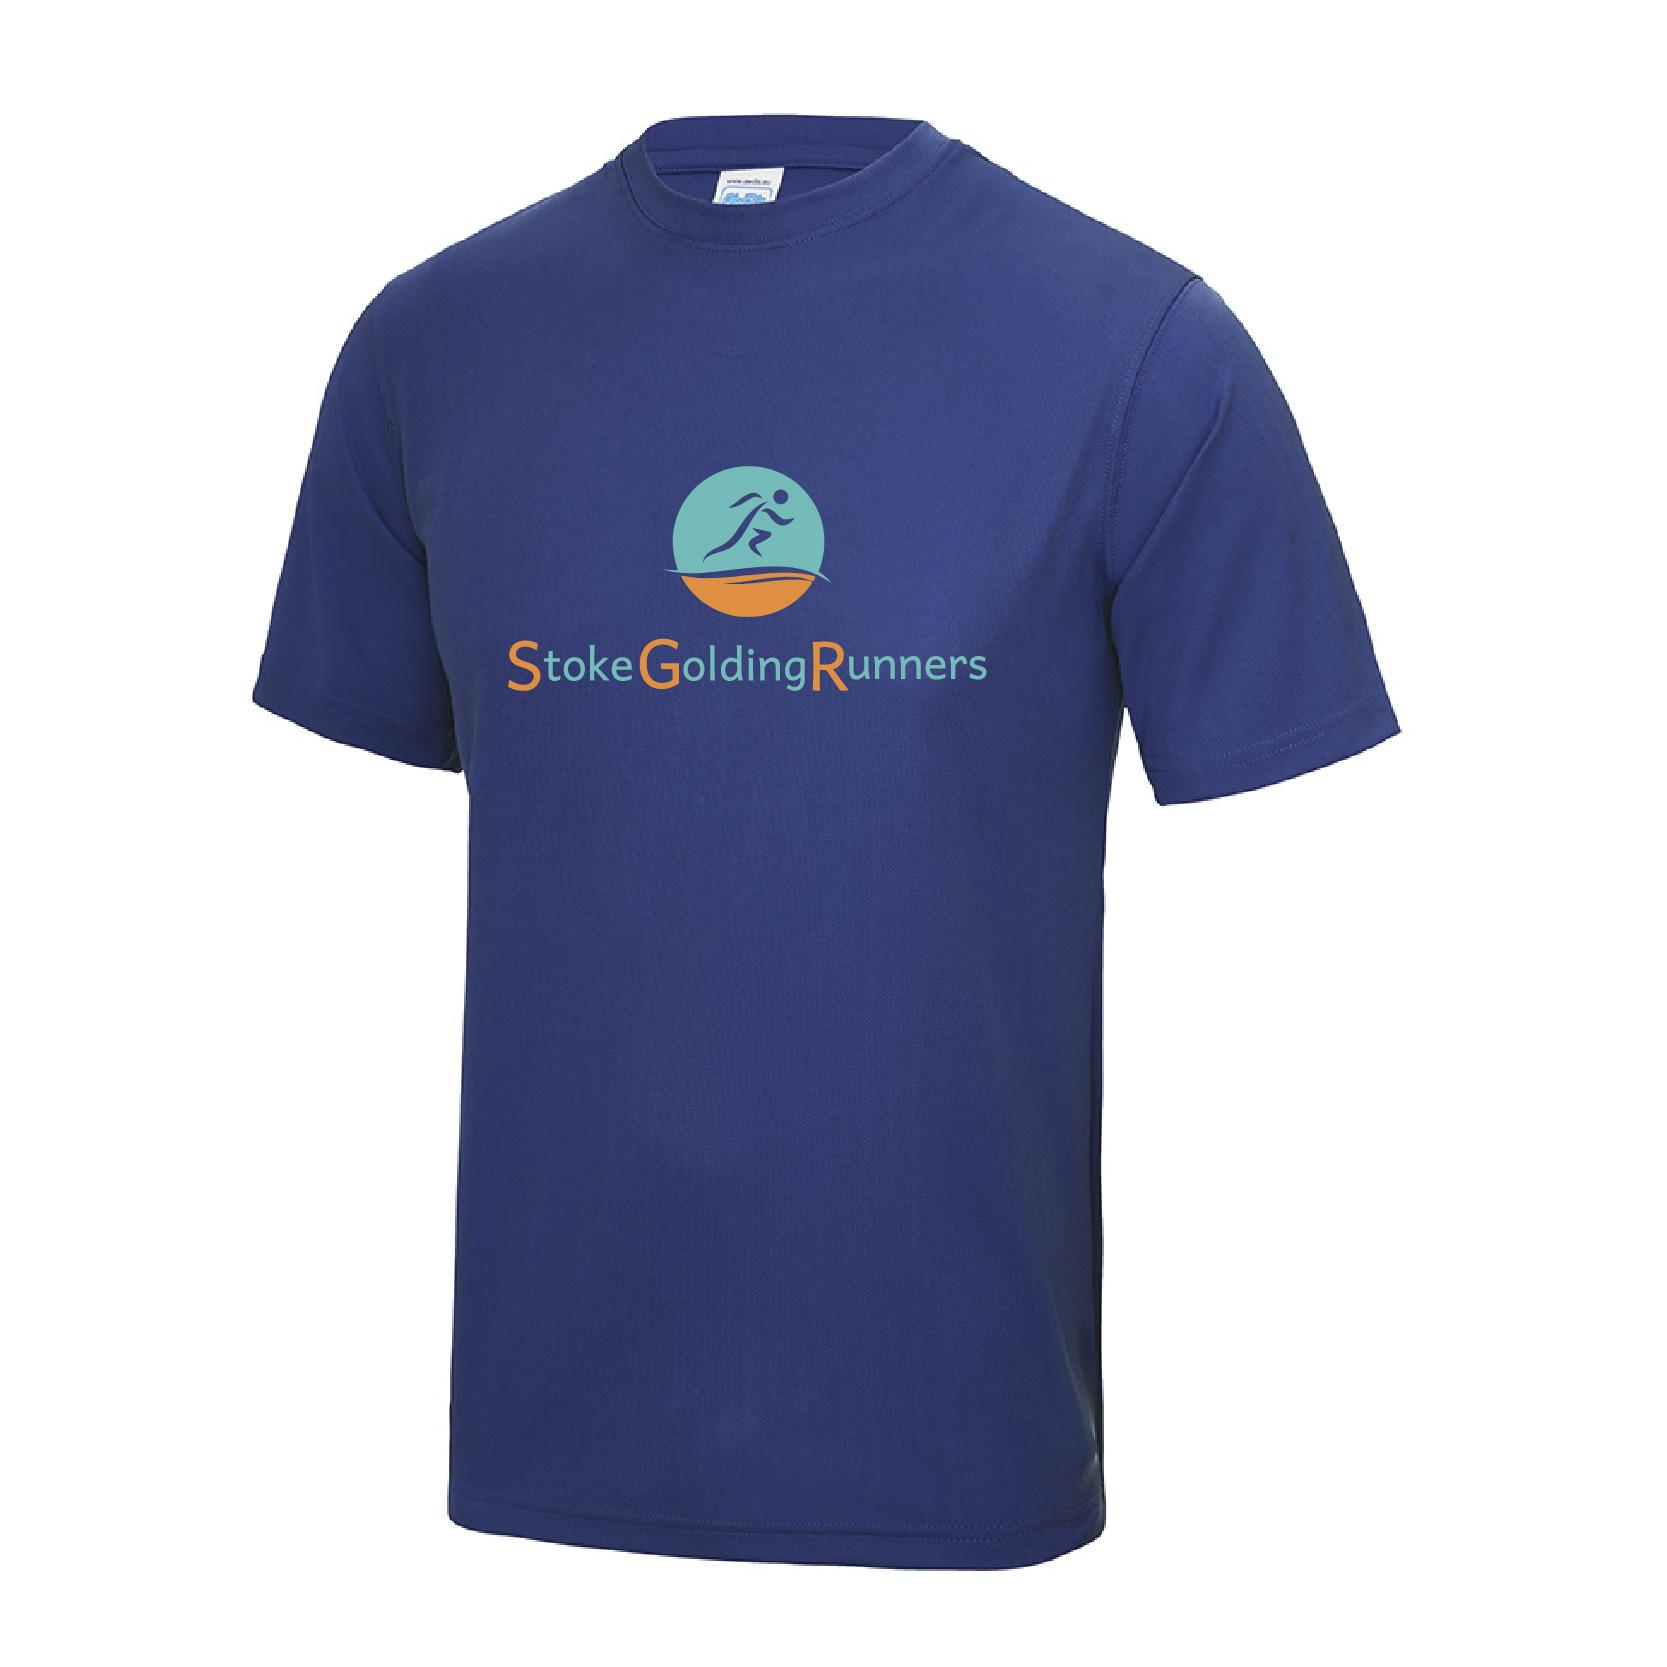 Stoke Golding Runners Club T-Shirt